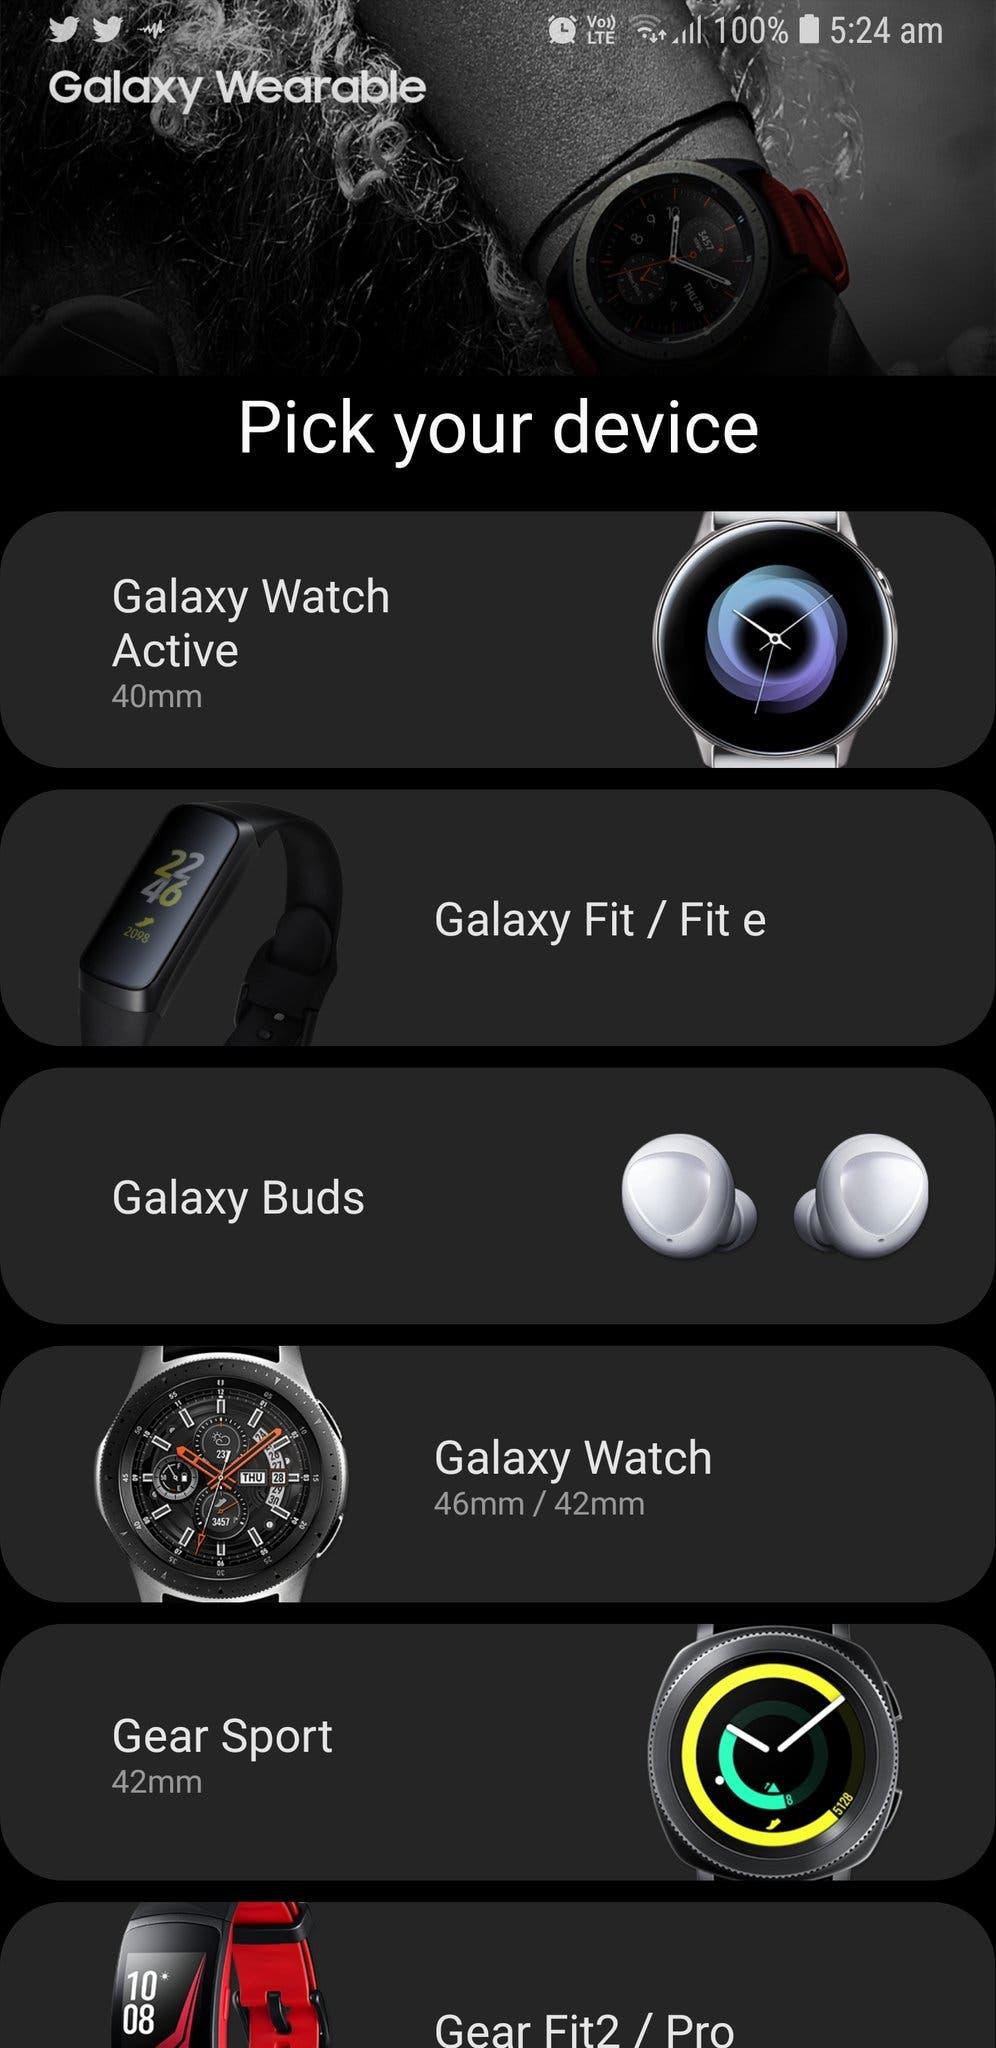 Galaxy wearables